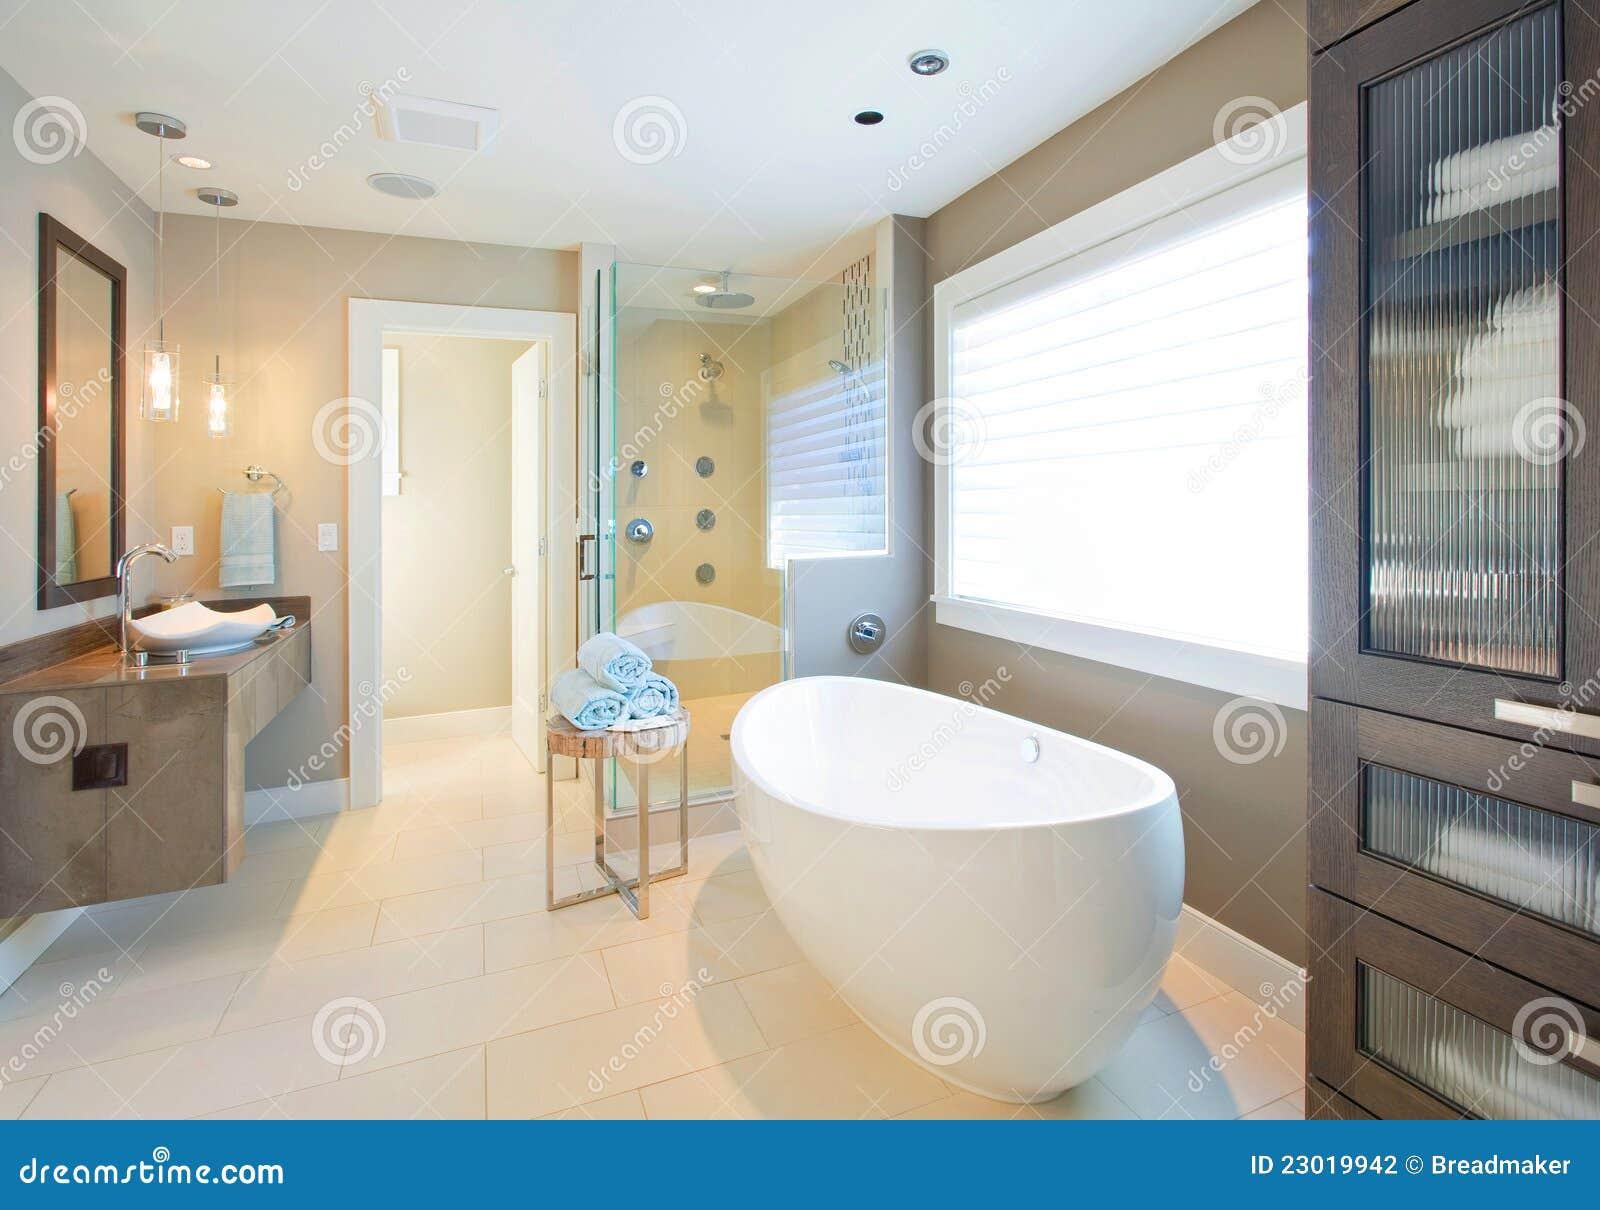 Salle De Bain Fleurie ~ salle de bains de luxe photo stock image du maison module 23019942